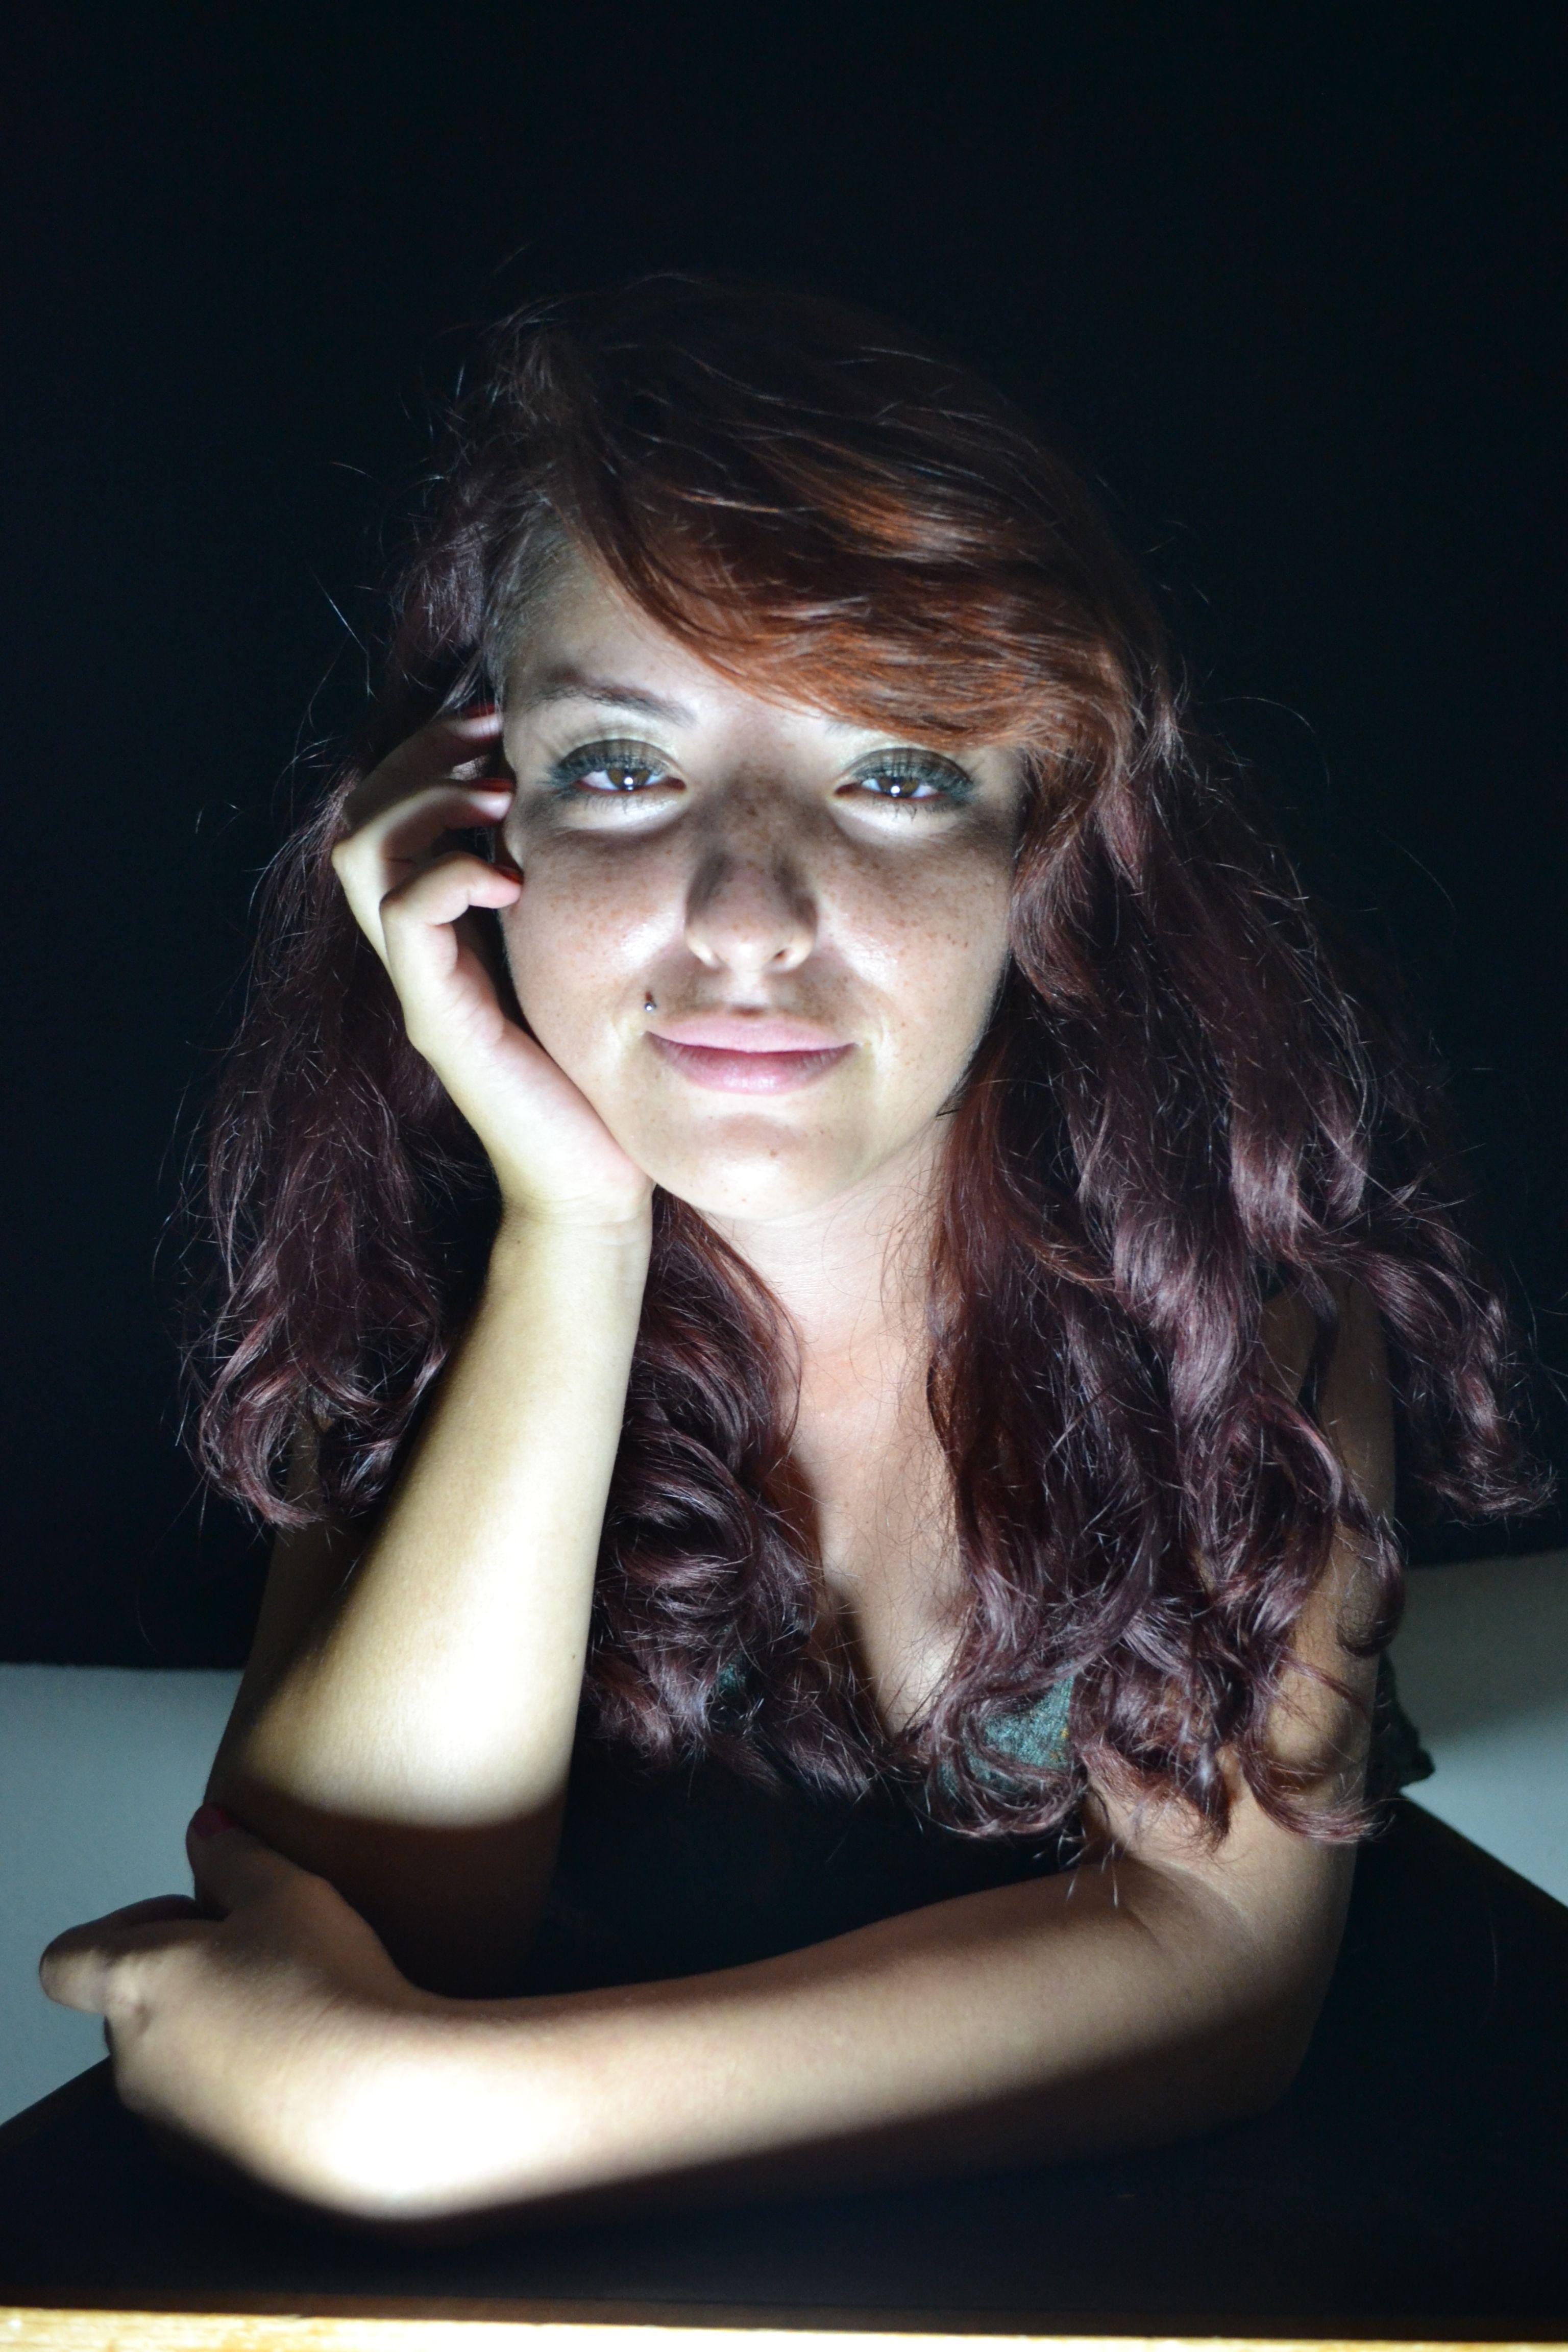 Modelo: Rosa Elizabeth Luz senital